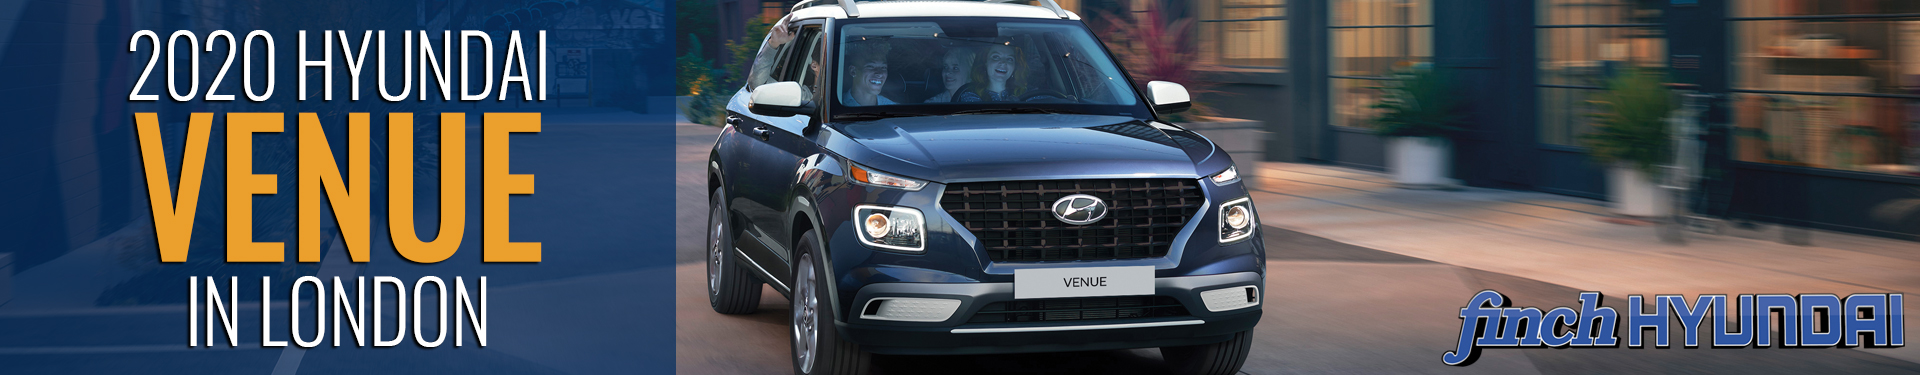 Discover the new 2020 Hyundai Venue in London Ontario, Sarnia, Stratford & Woodstock from Finch Hyundai, new SUV in London